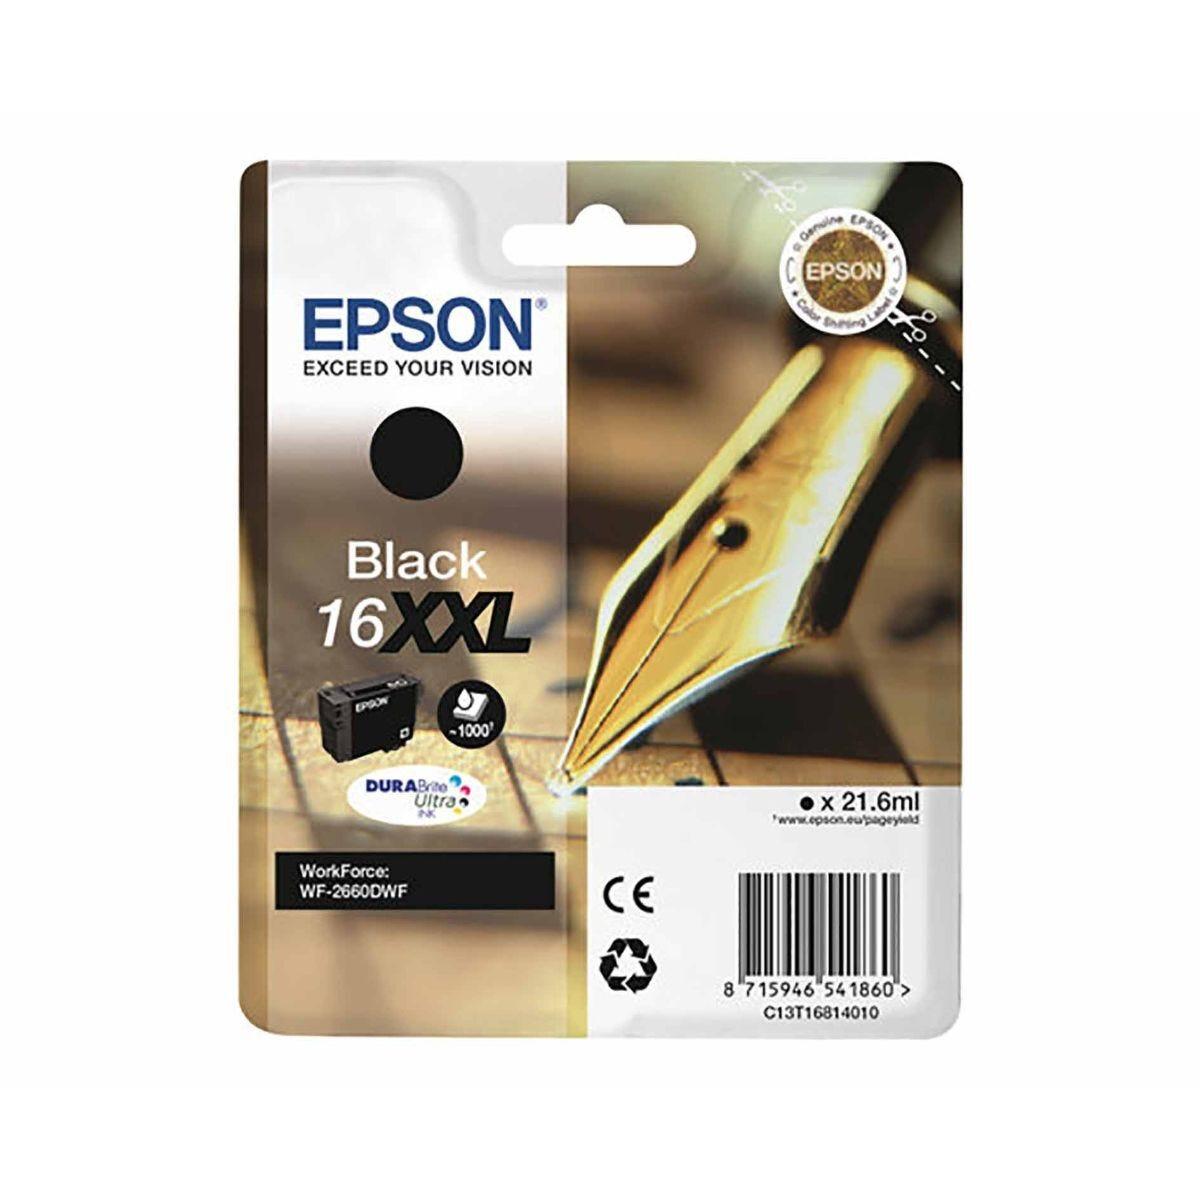 Epson 16XXL Pen and Crossword Black Original Ink Cartridge